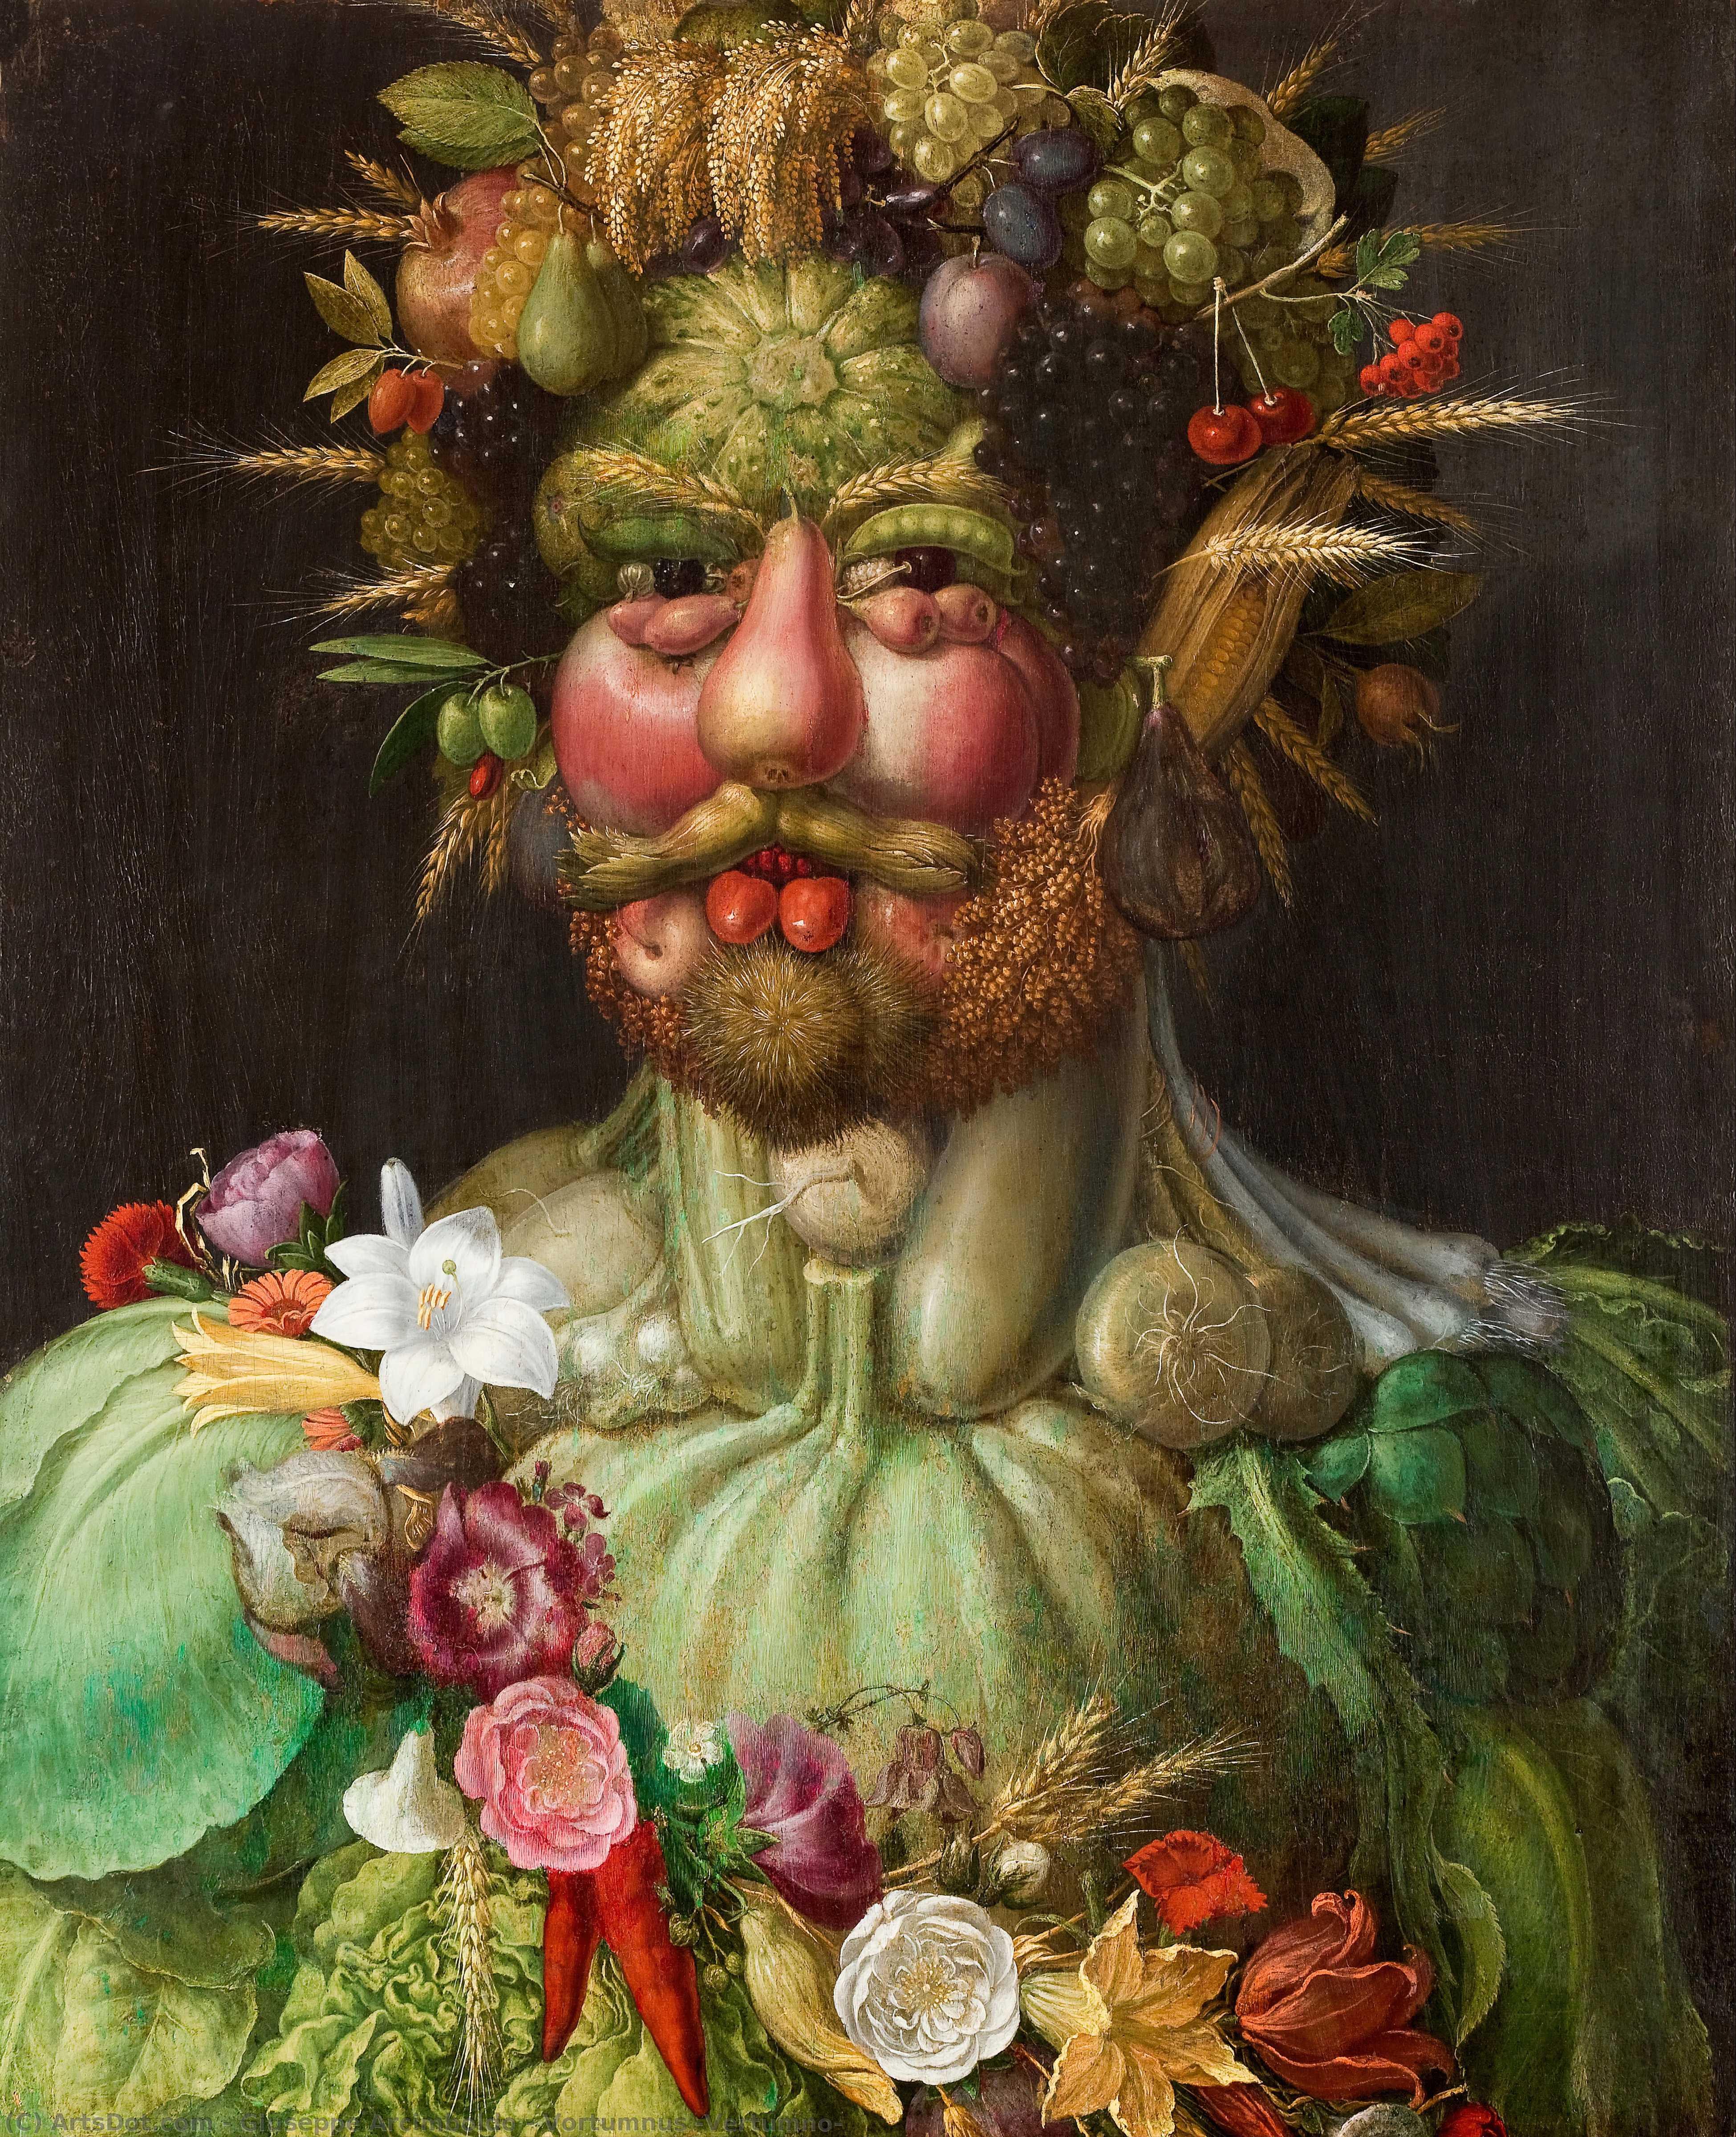 Wikioo.org - The Encyclopedia of Fine Arts - Painting, Artwork by Giuseppe Arcimboldo - Vortumnus (Vertumno)